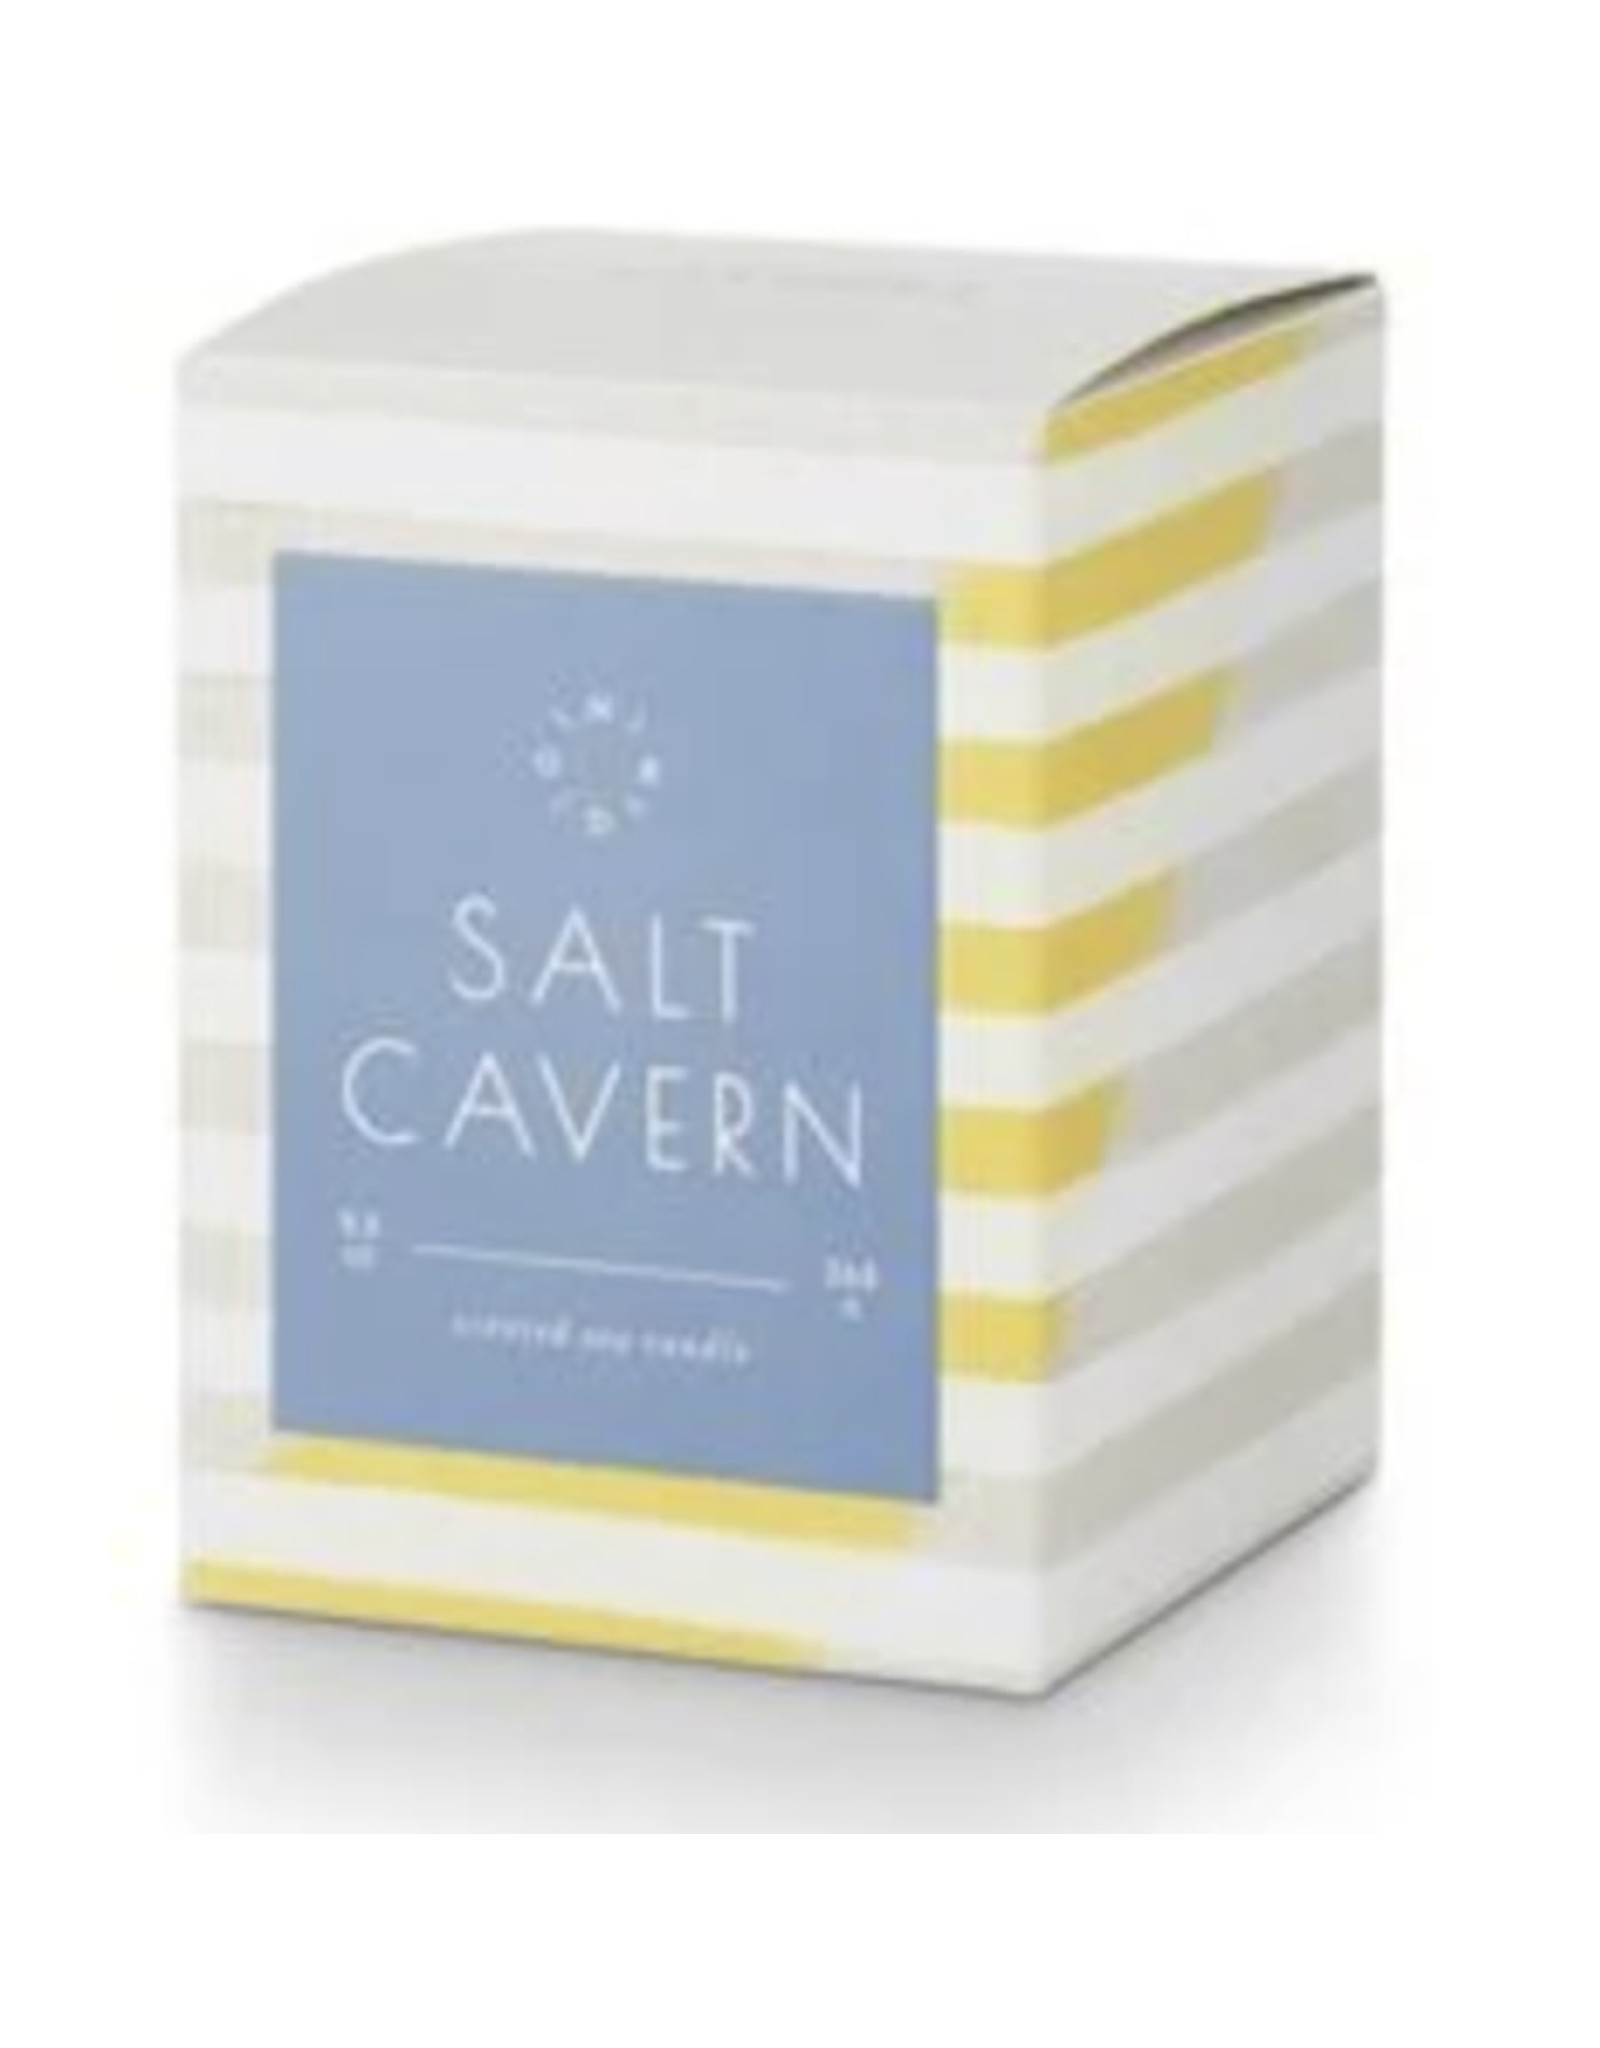 Illume Salt Cavern Fjord & Form Seafare Glass Candle